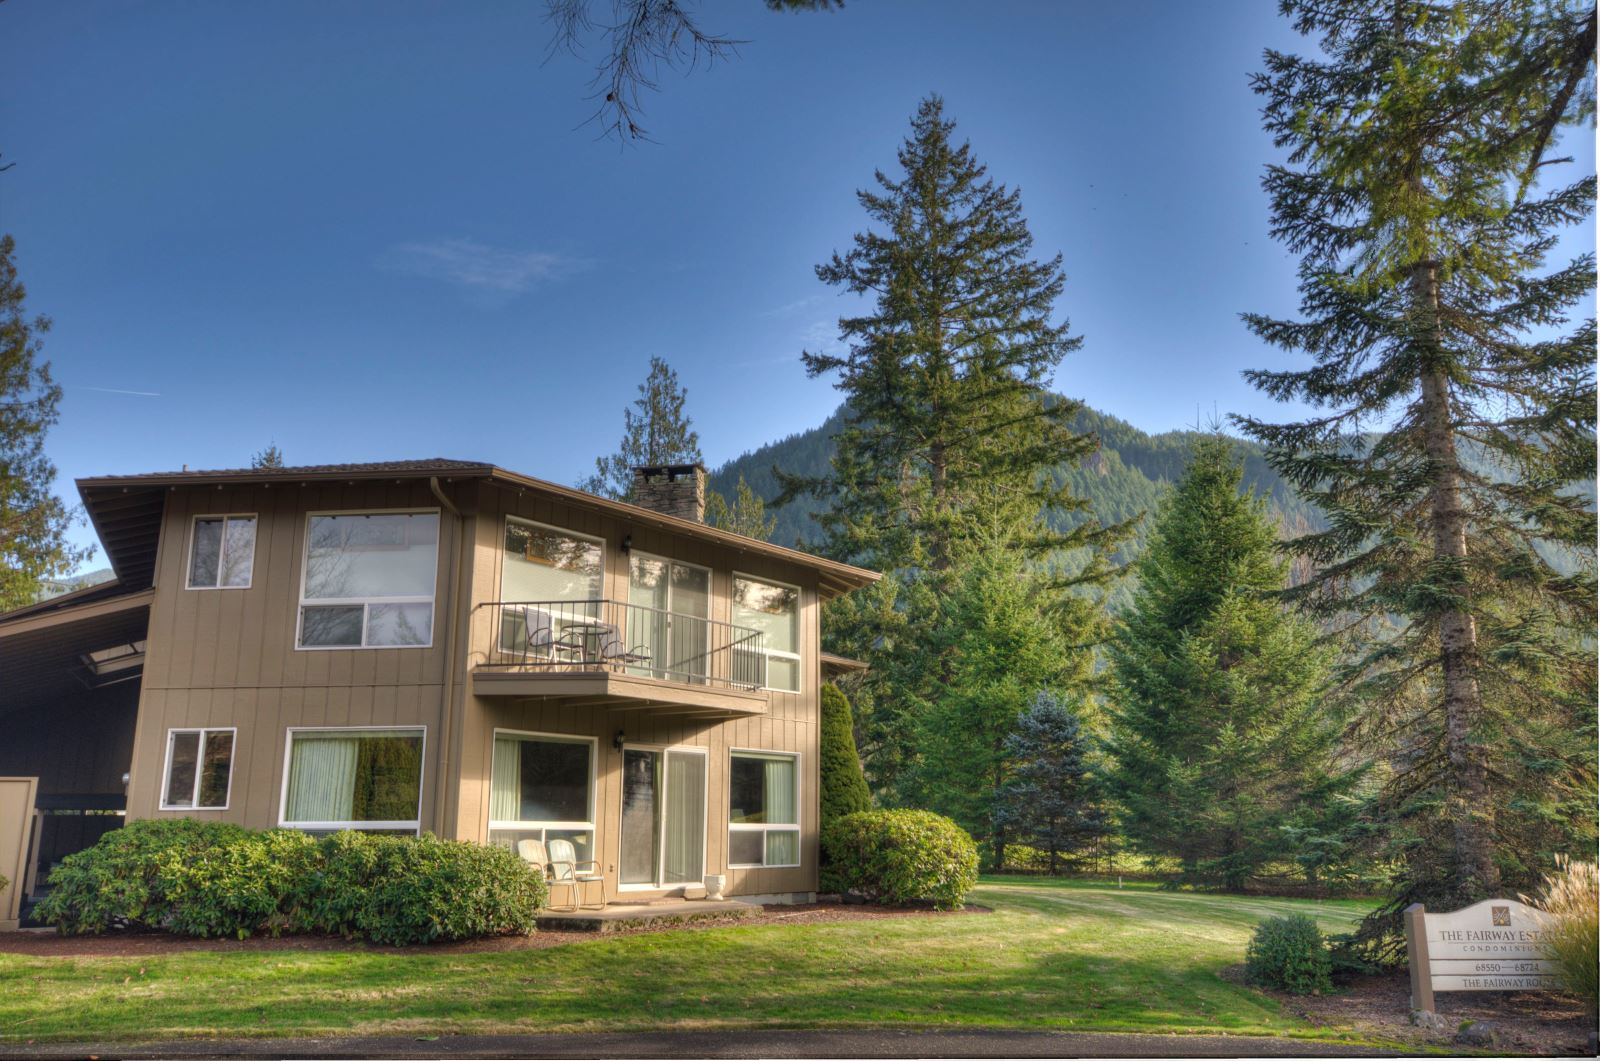 Fairway Estates Condo at the Mt. Hood Oregon Resort